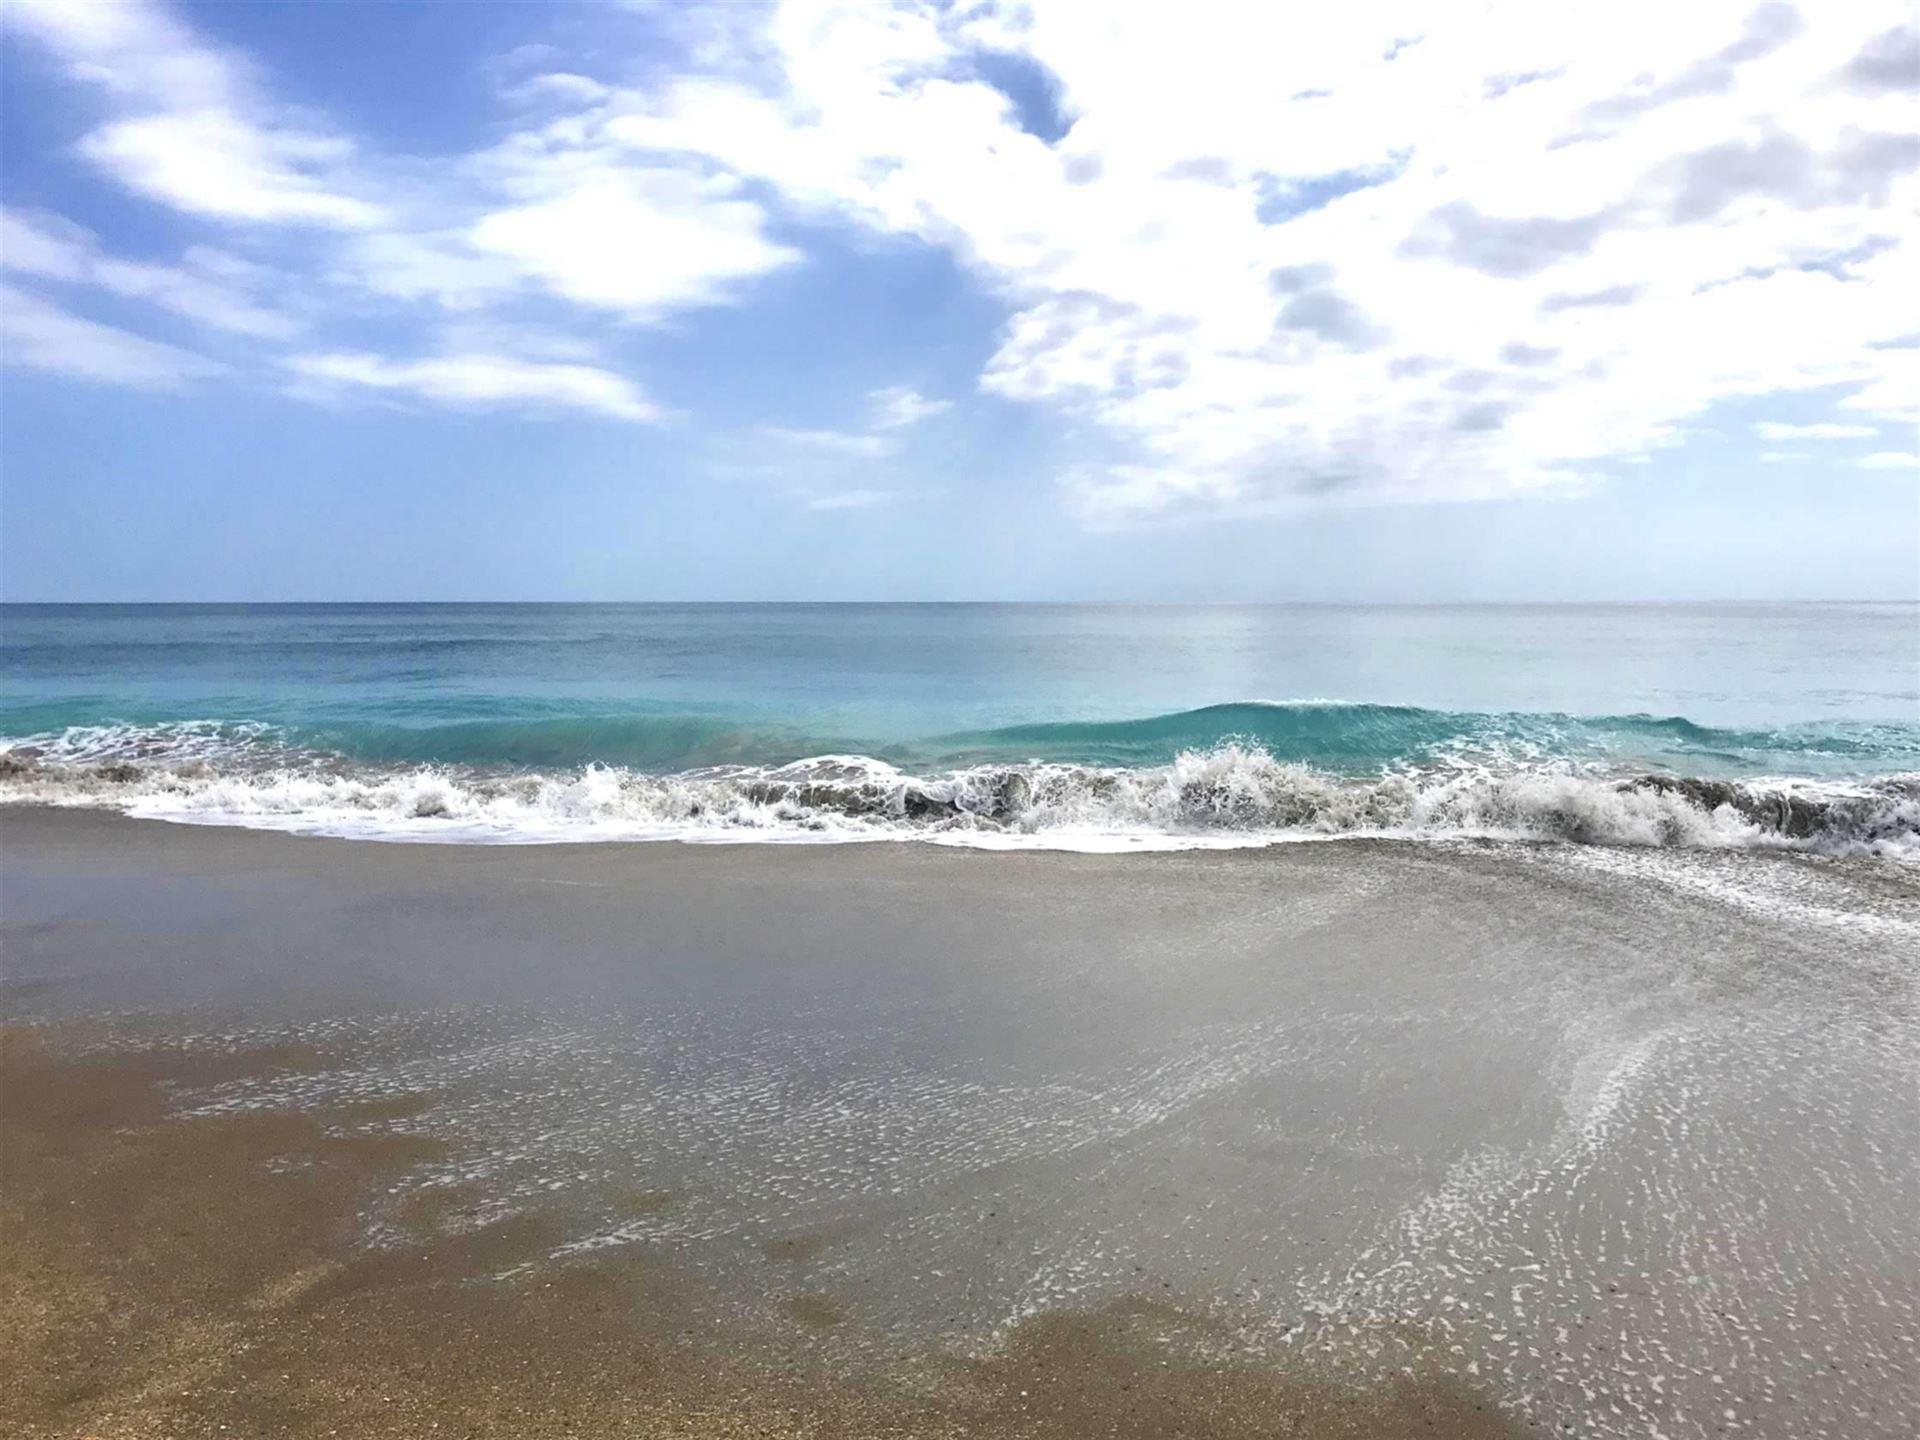 1289 NE Ocean Boulevard #7, Stuart, FL 34996 - #: RX-10627211